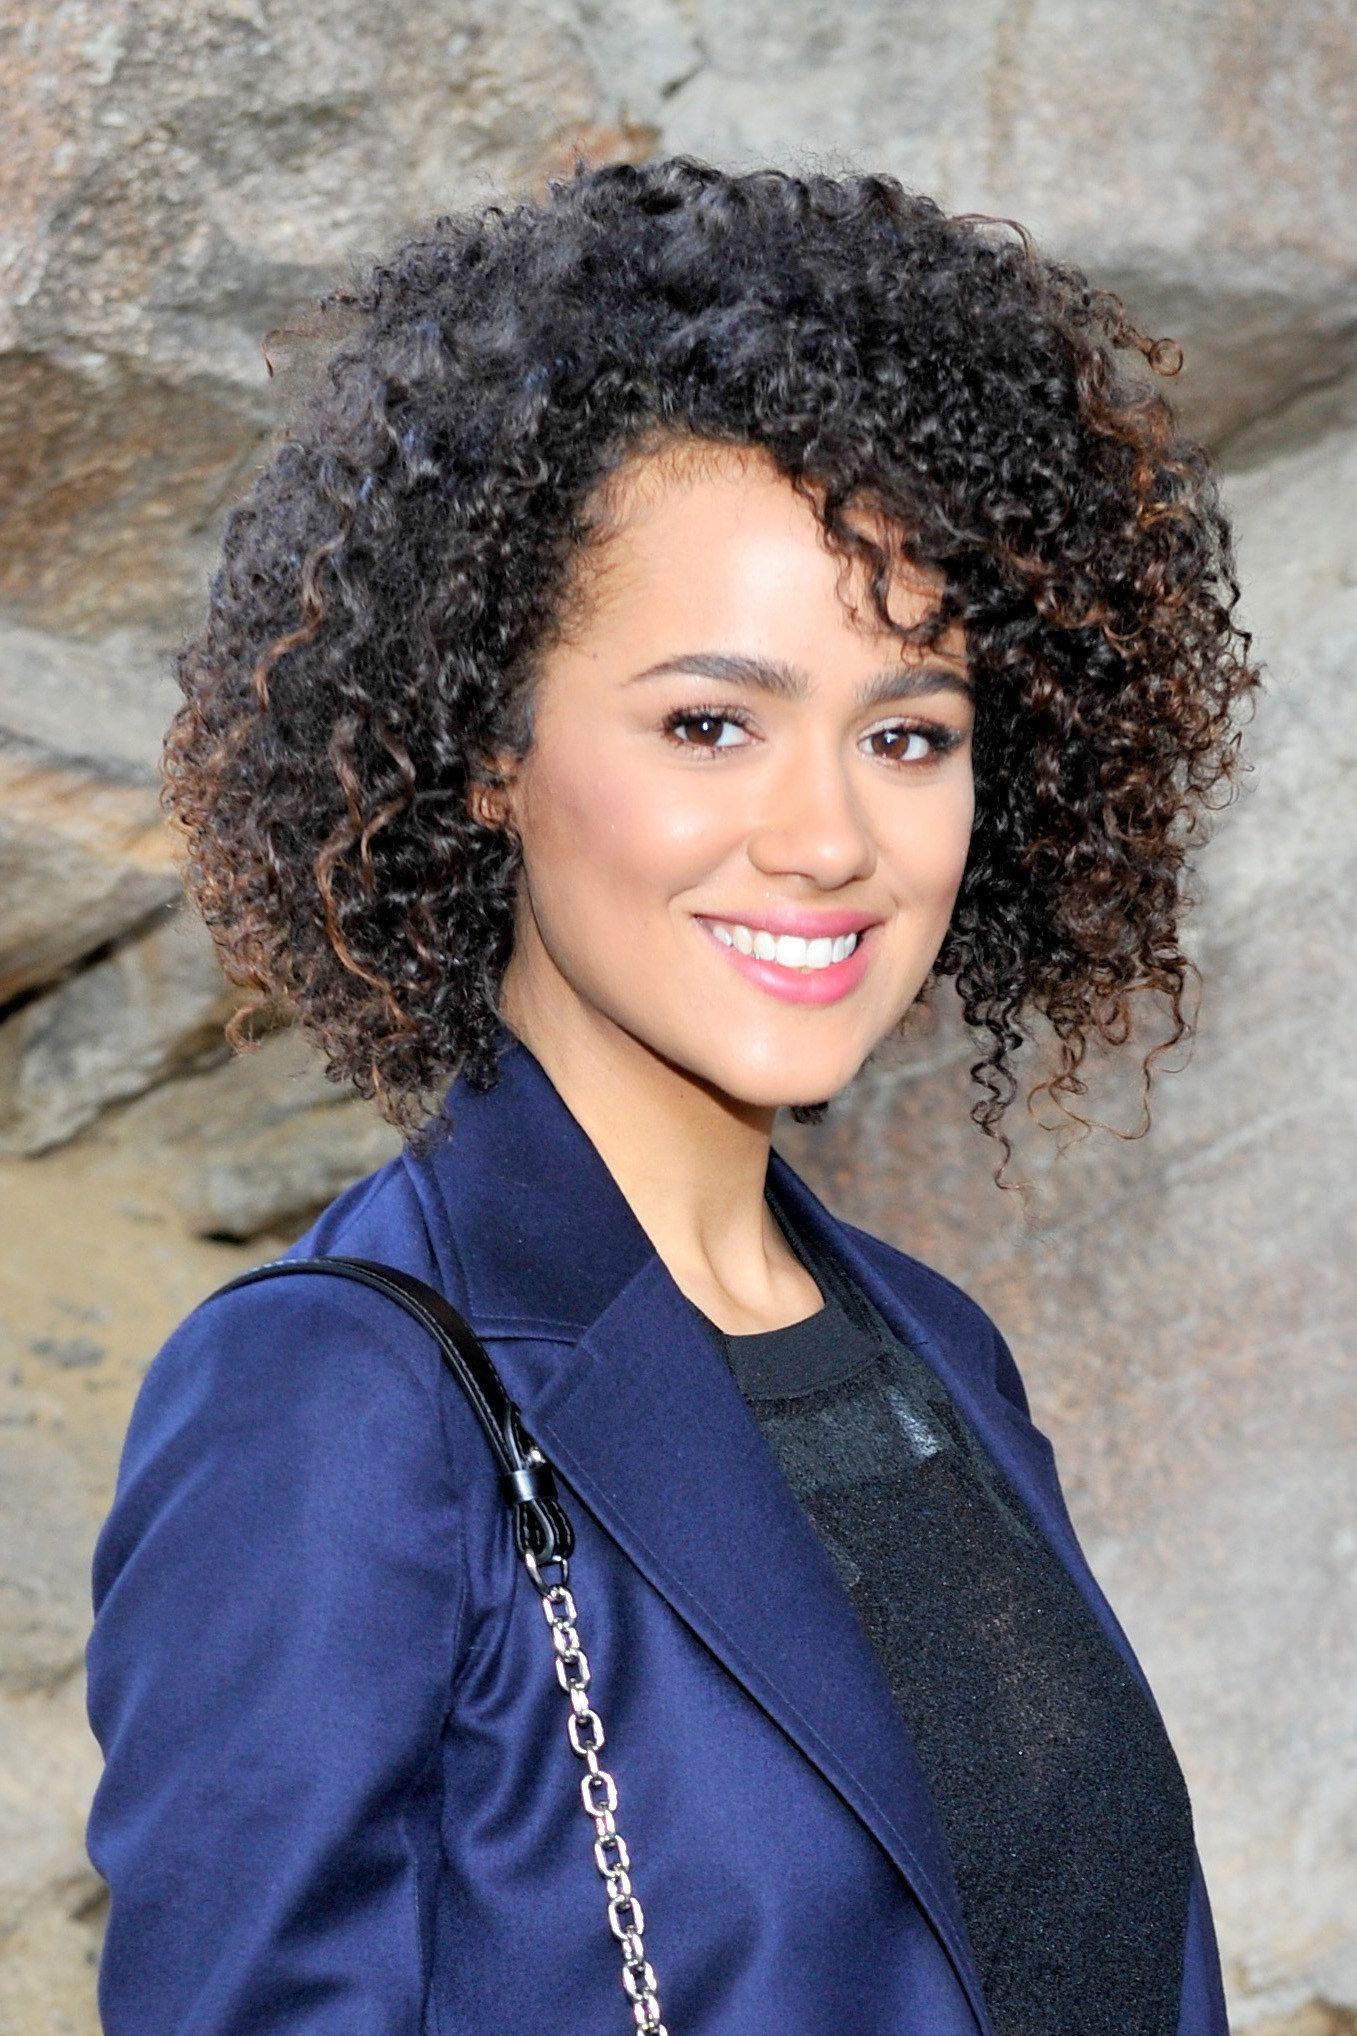 You Are Gonna See Some Celebrities With Curly Hair Female On Each Celebrity Hairstyle Will Look Ve Lockige Frisuren Frisuren Schulterlang Naturlocken Frisuren